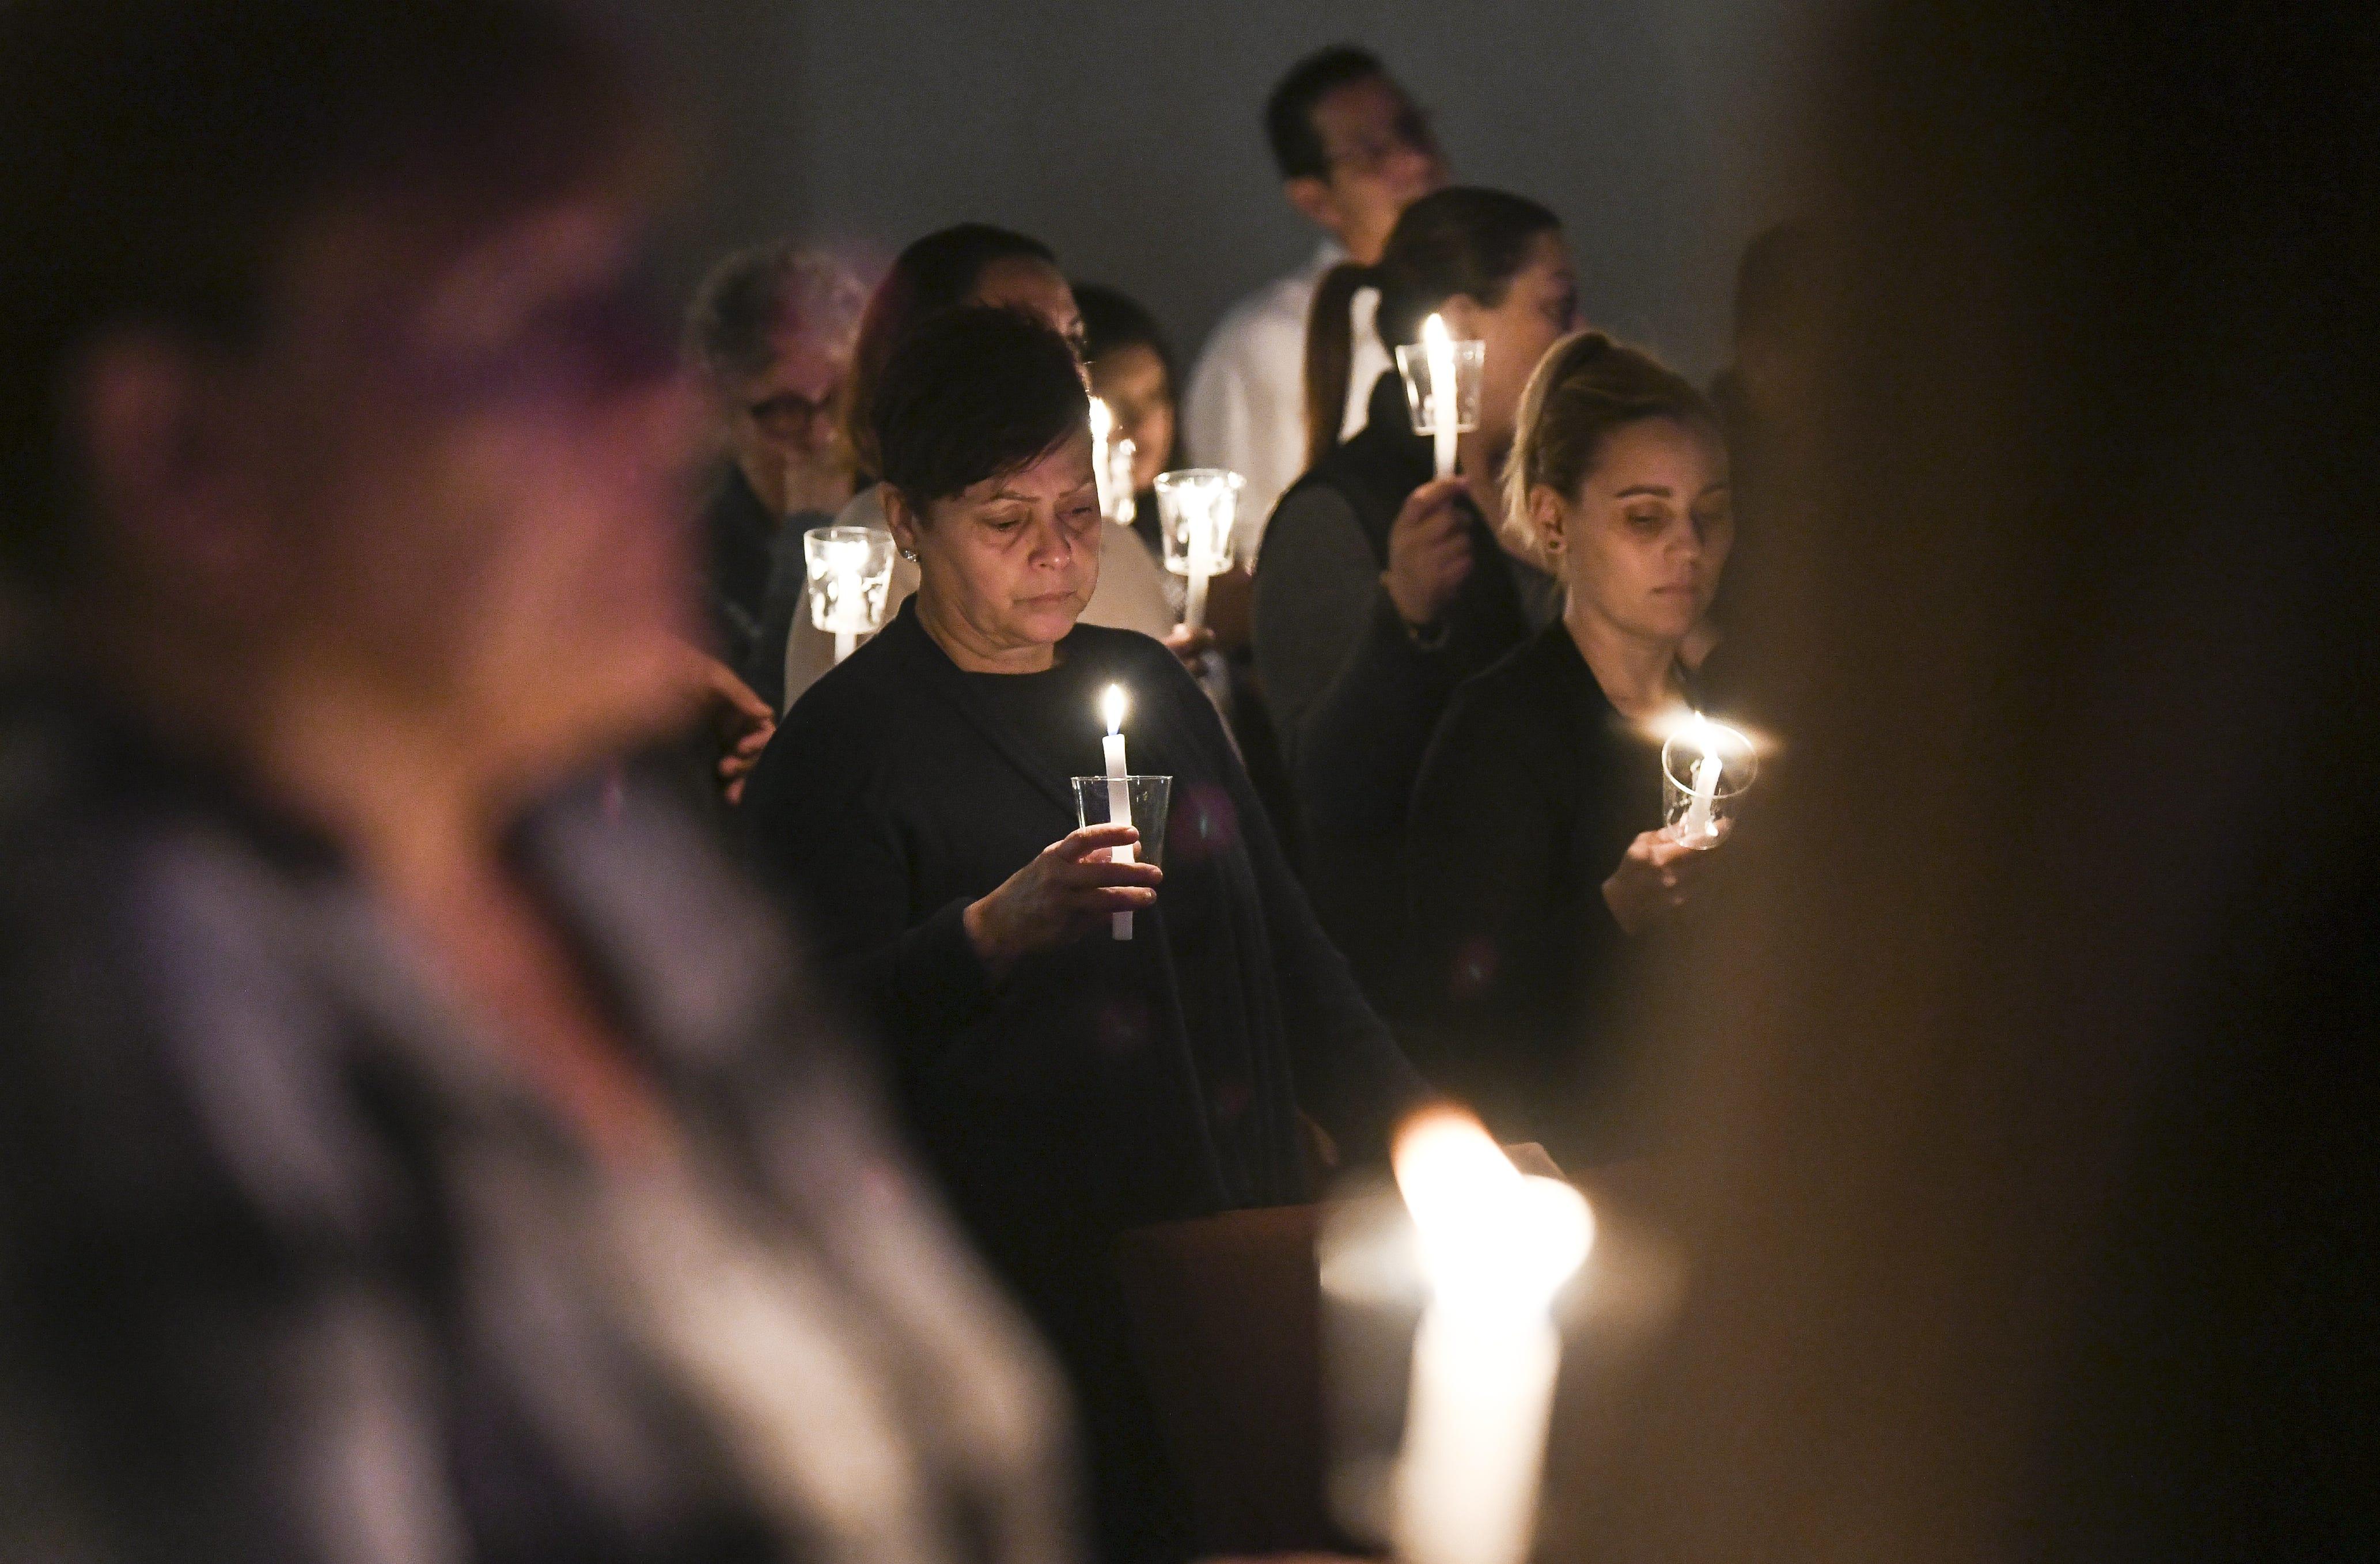 Nearly 200 attend church vigil for victim of Sebring, Florida, bank shooting